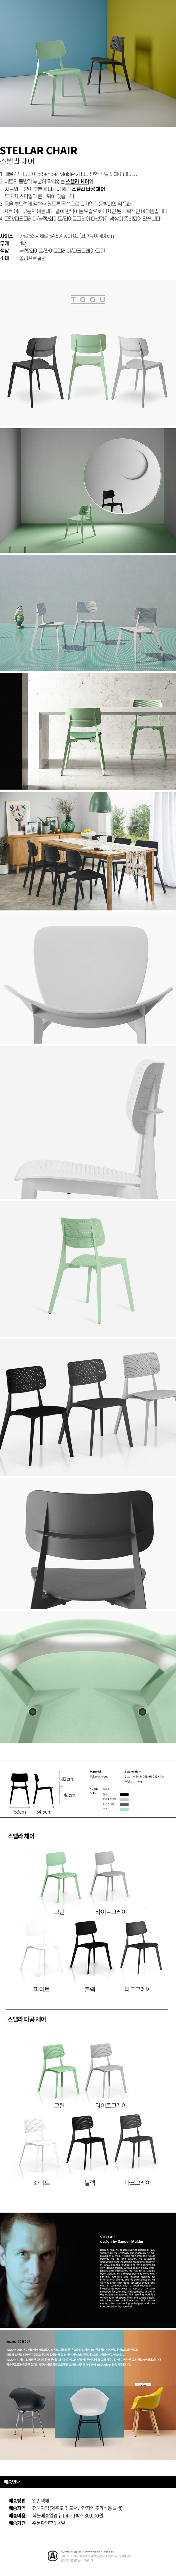 (TOOU) STELLAR 스텔라 체어 - Light gray - 카페퍼니쳐, 169,800원, 디자인 의자, 인테리어의자